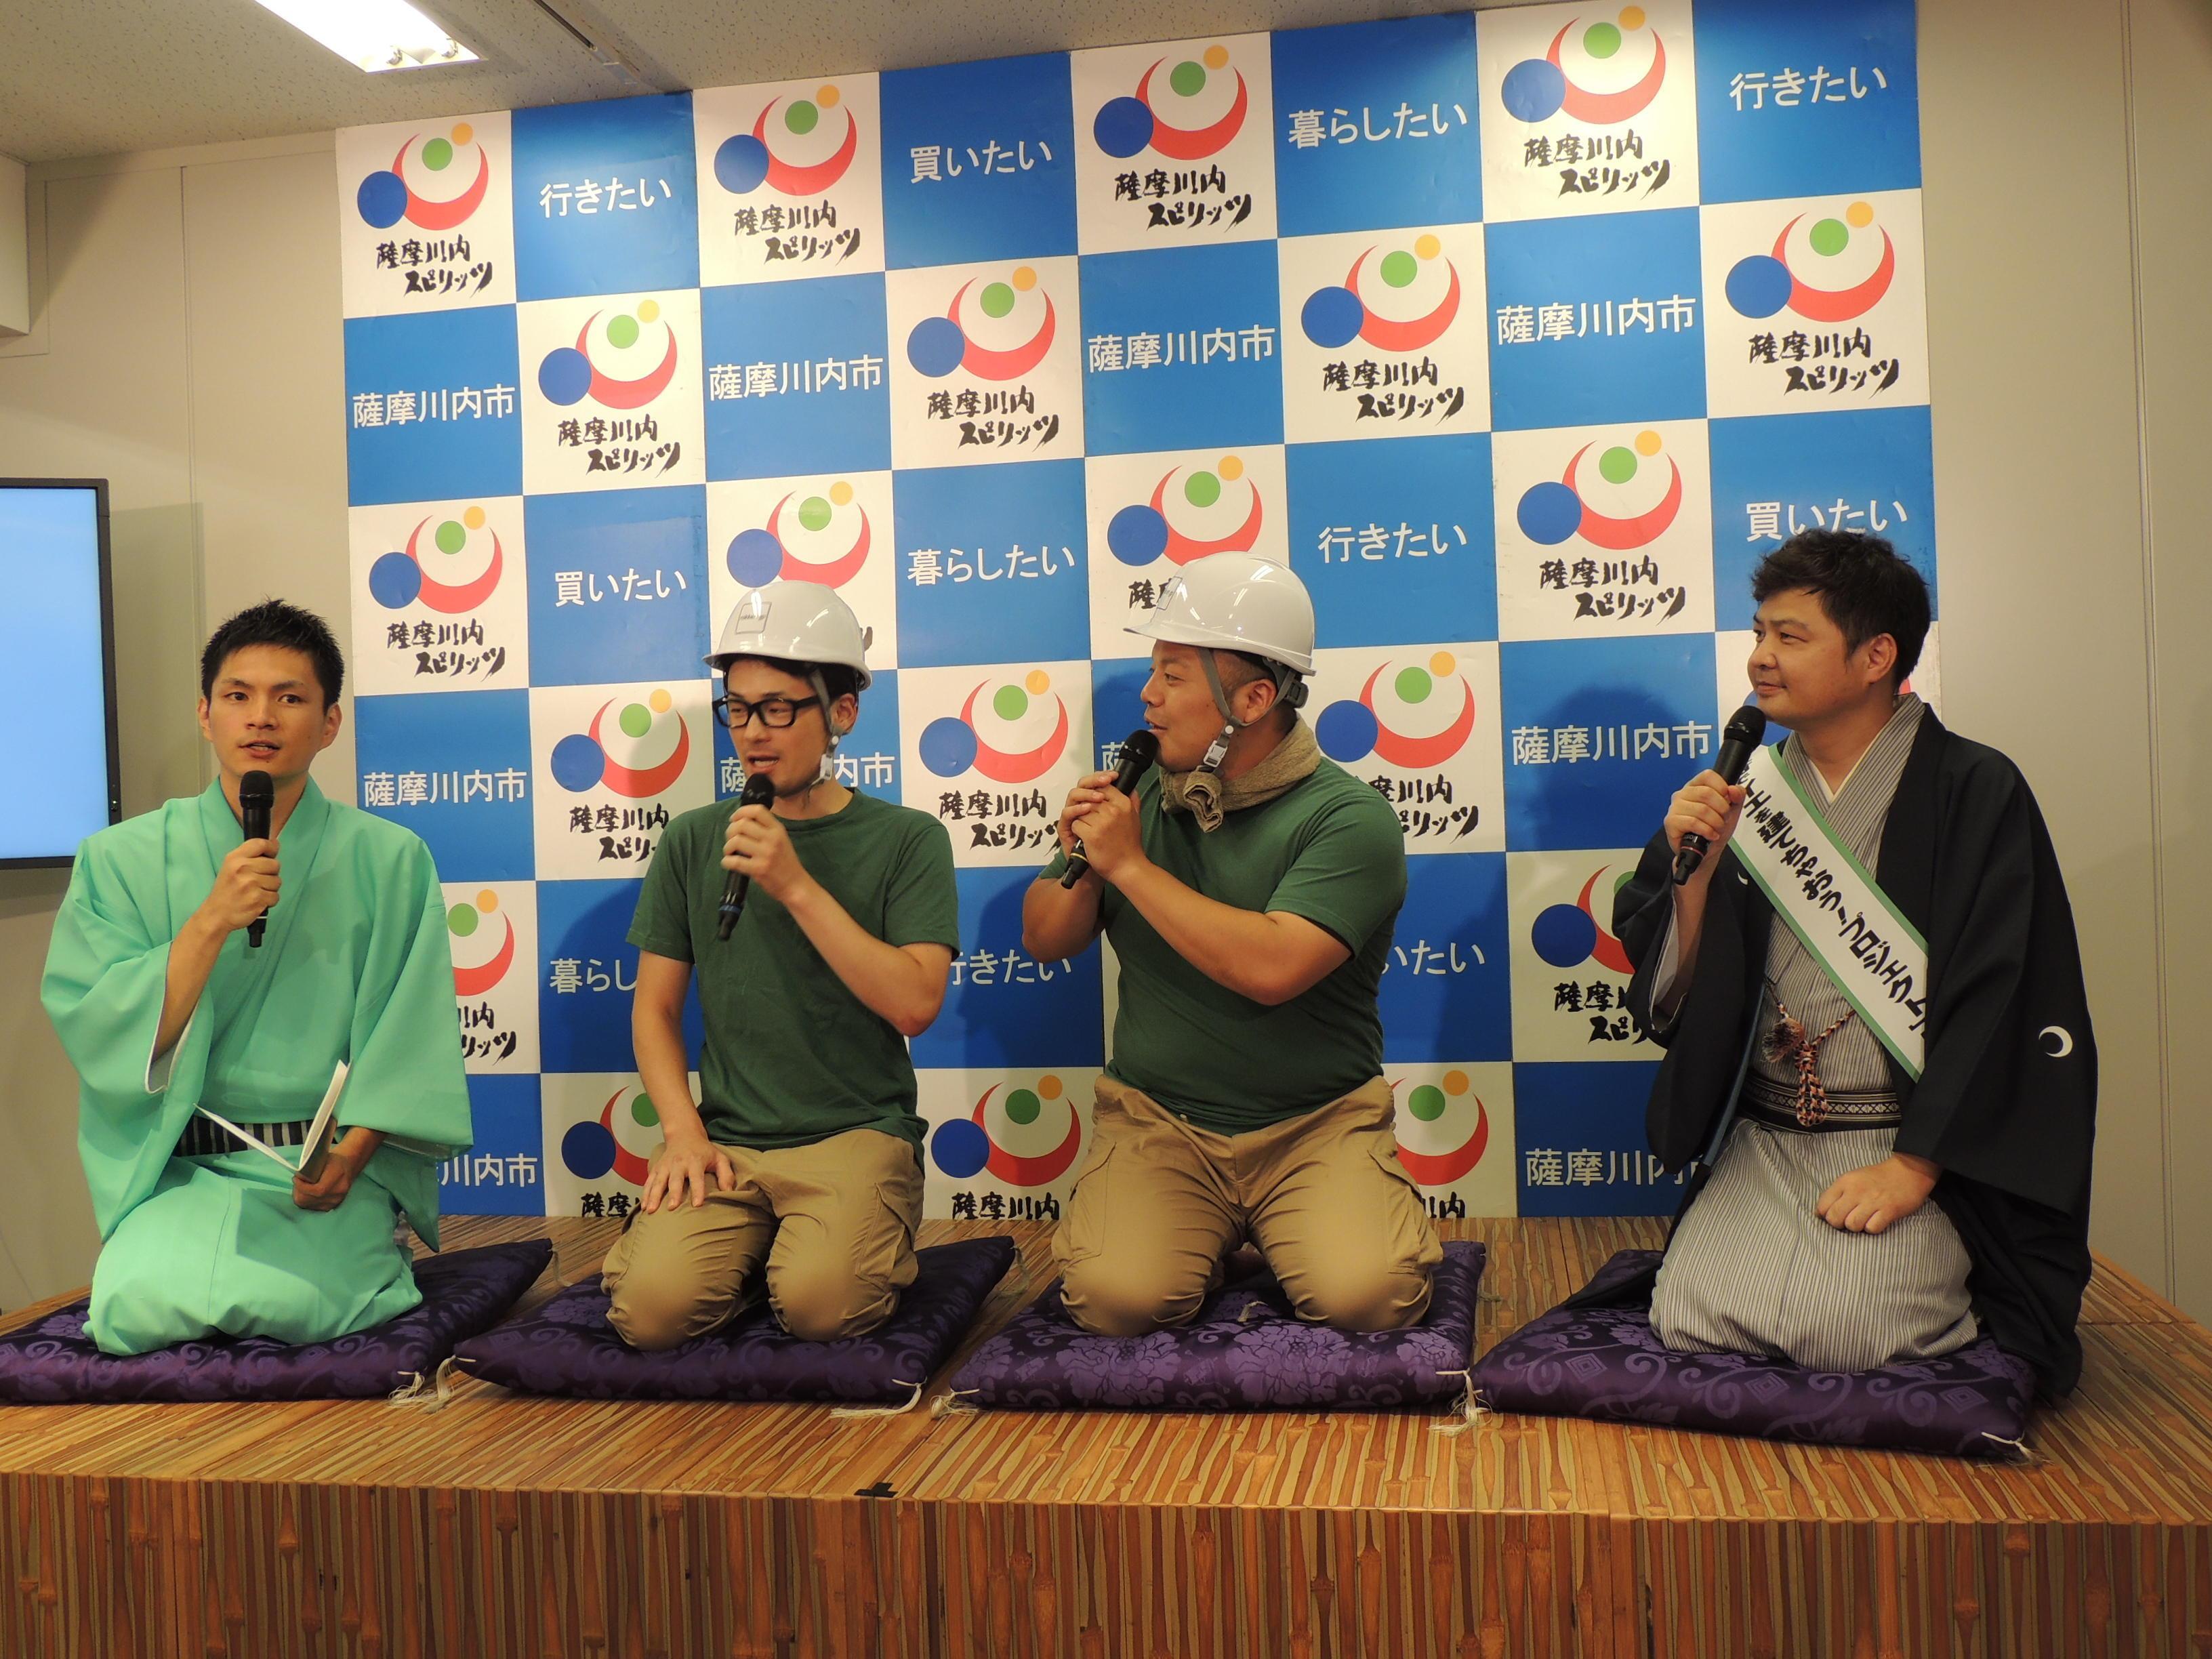 http://news.yoshimoto.co.jp/20160809001242-4778952f58be346f4eda229e9838887884e1fae2.jpg